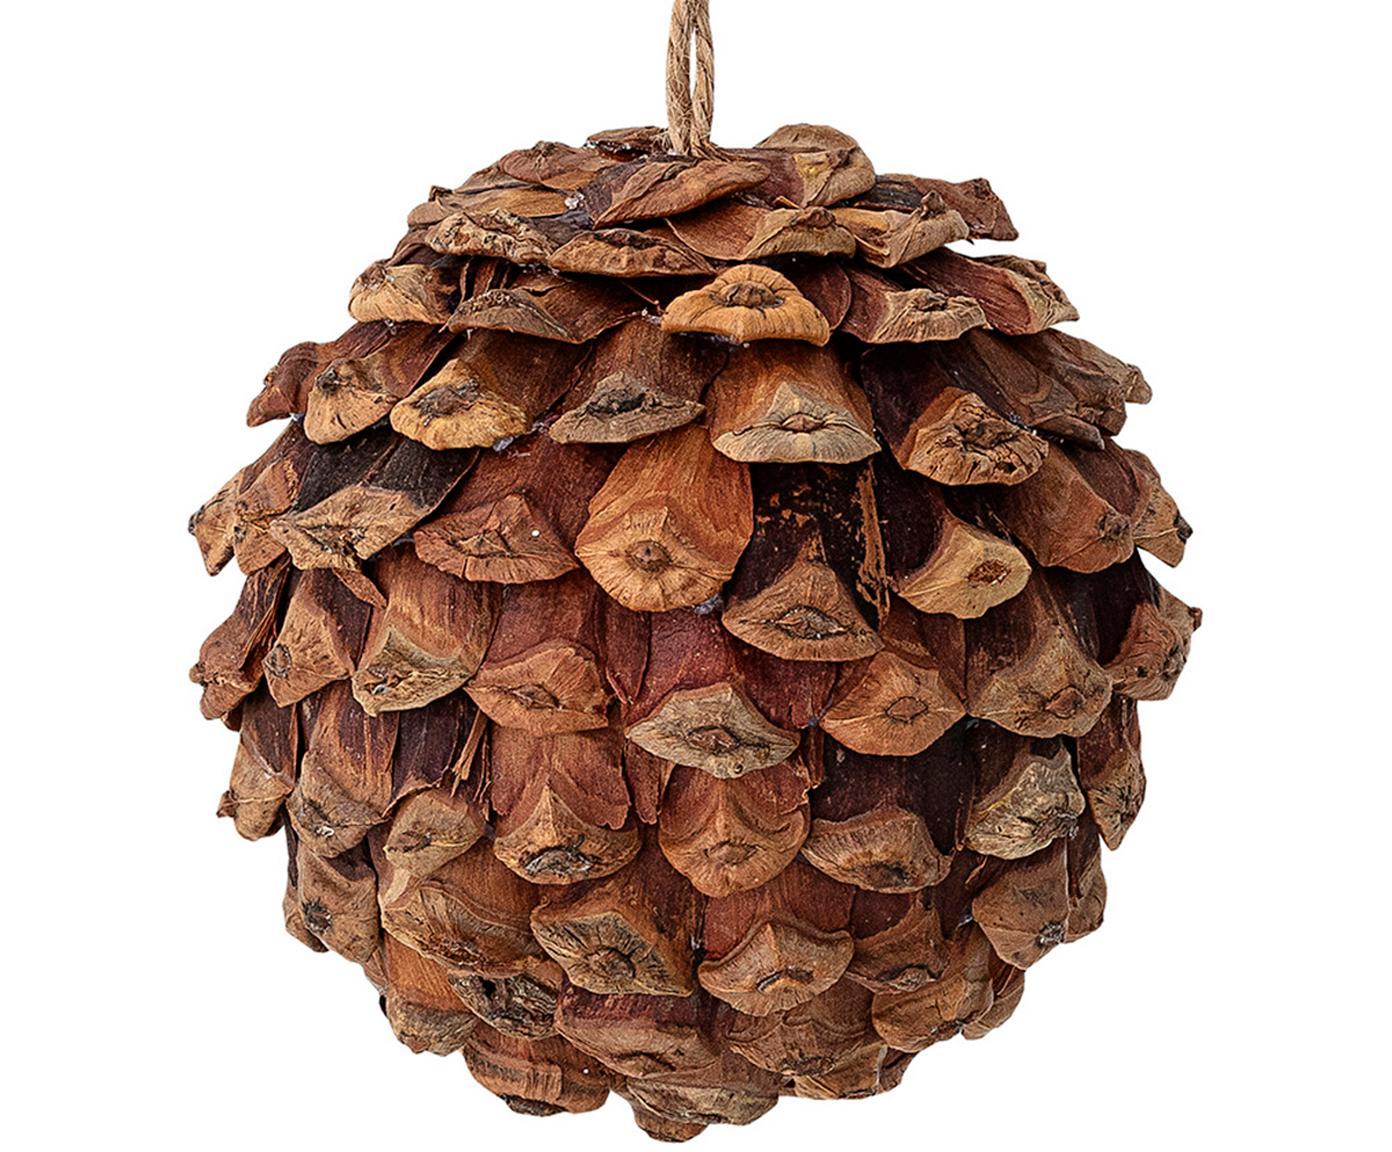 Baumanhänger Pinecone, Holz, Schaumstoff, Braun, Ø 8 cm